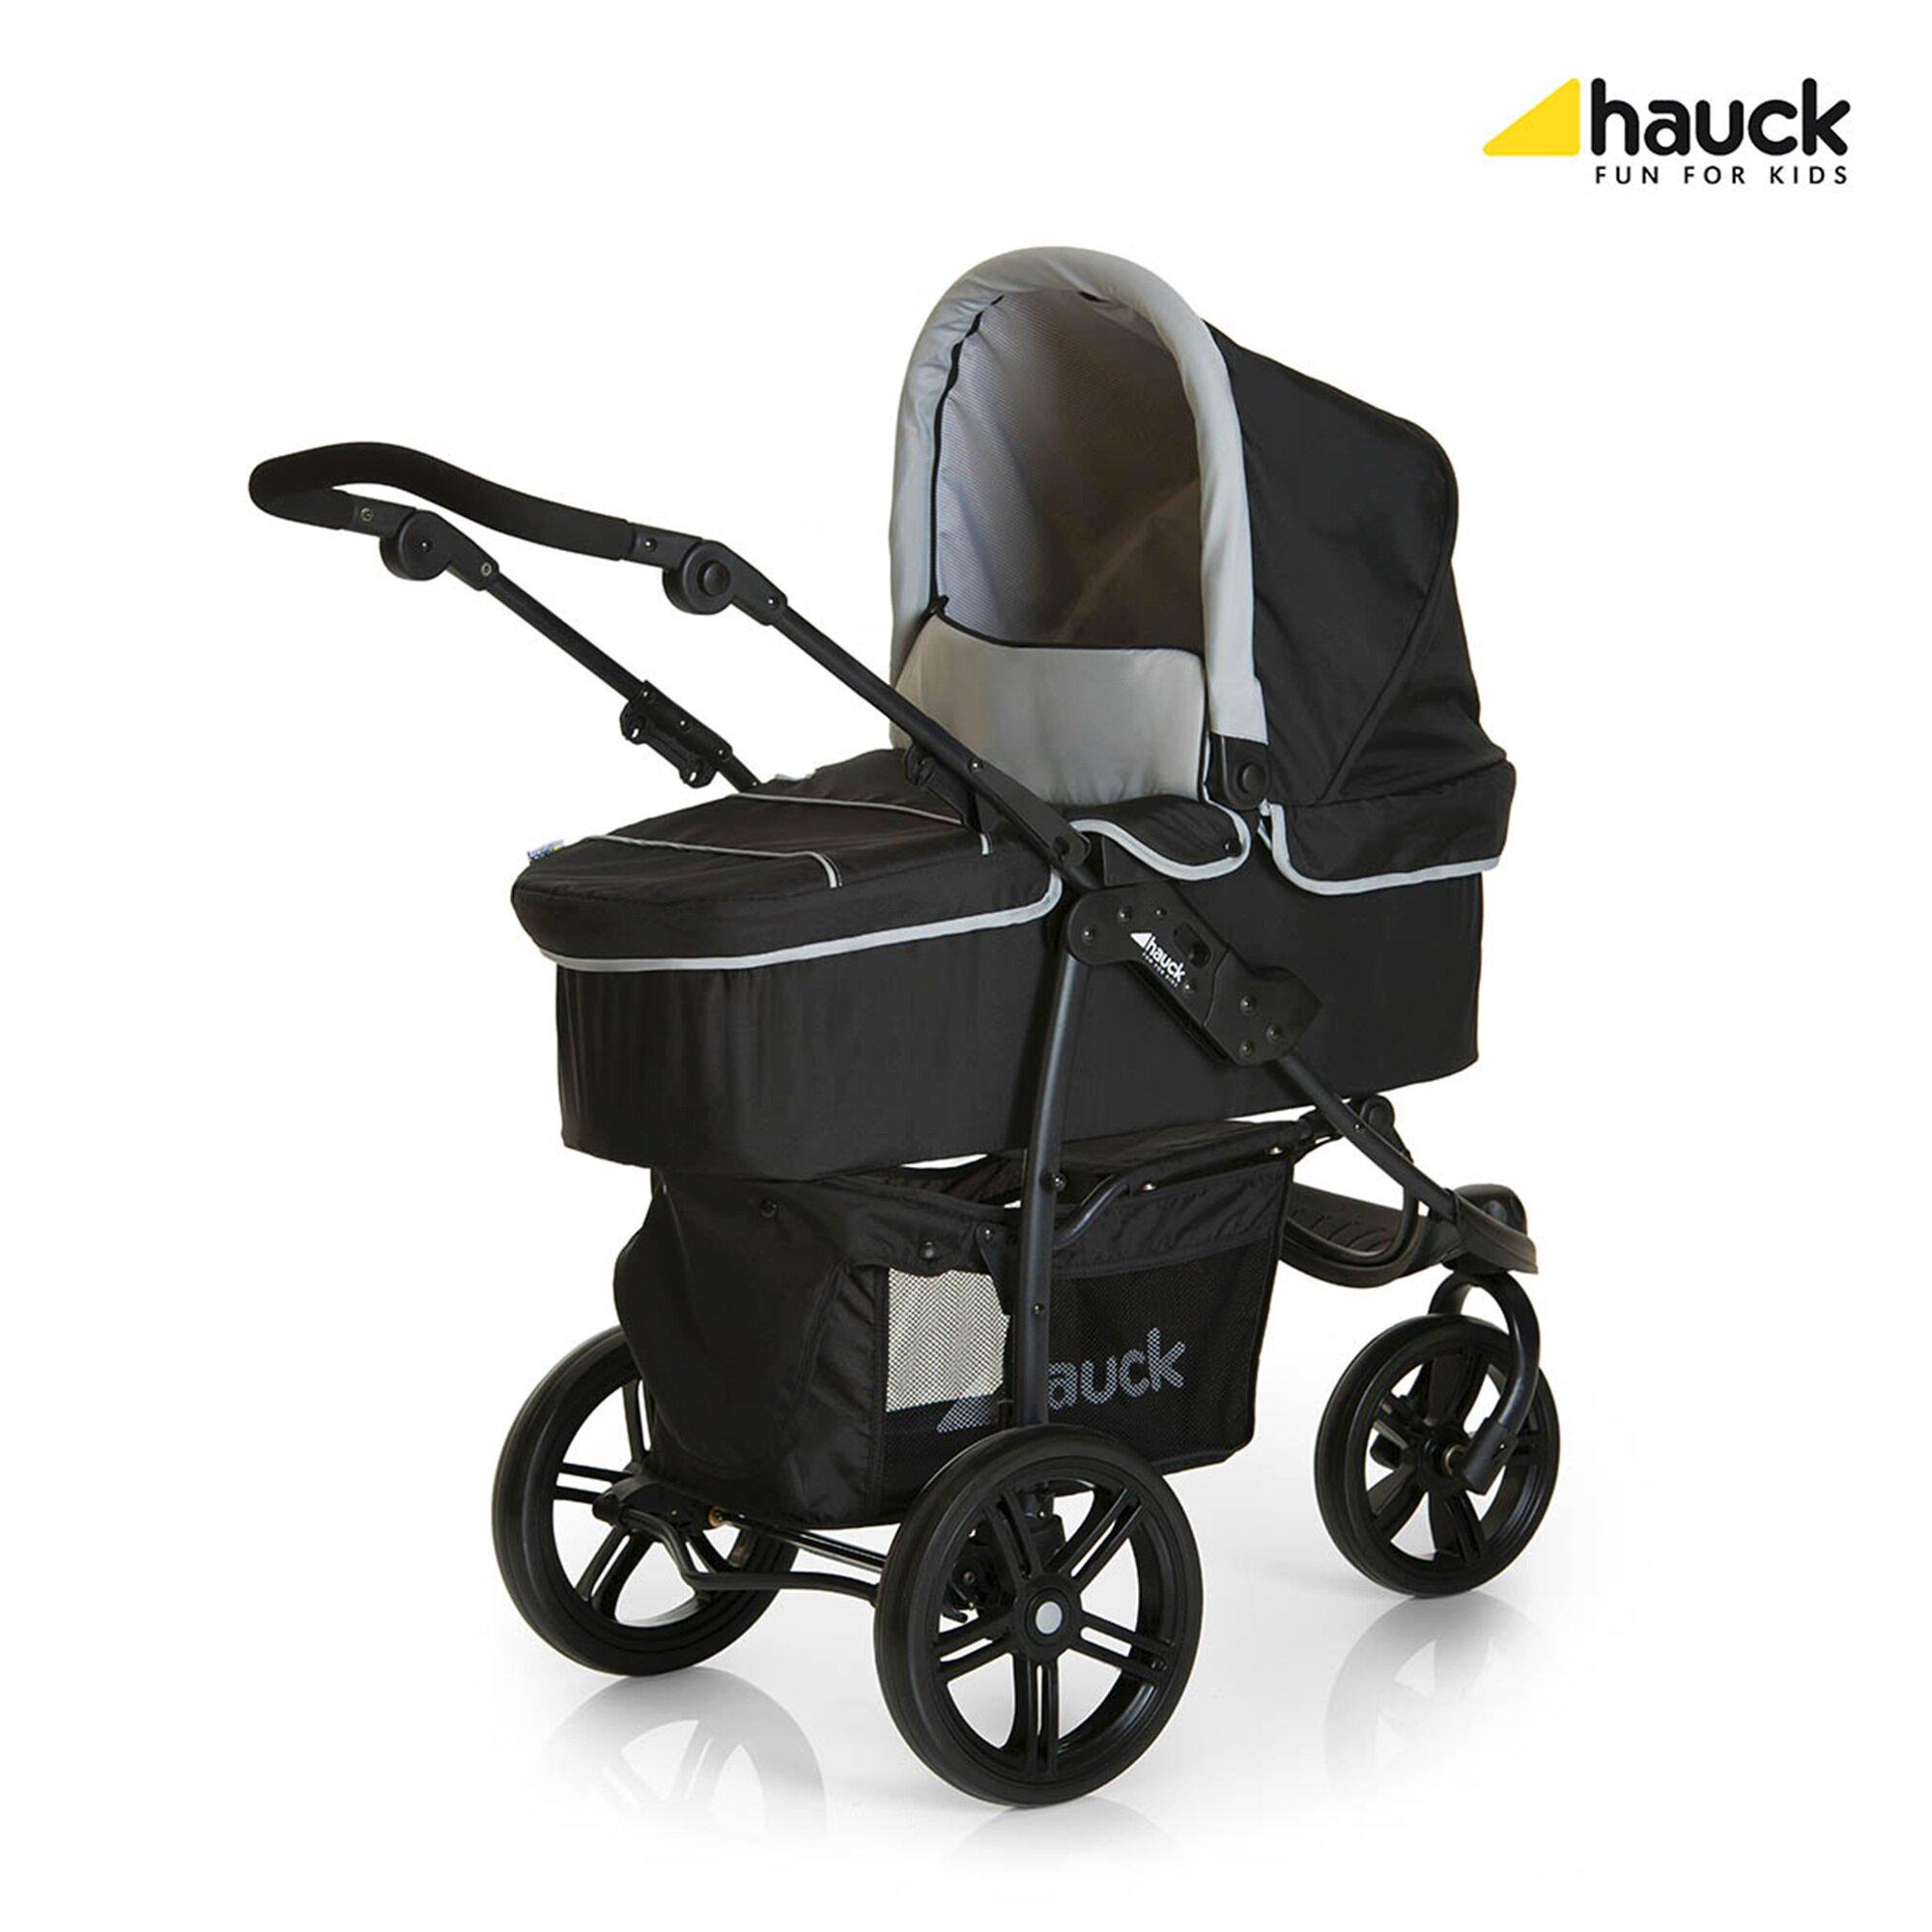 hauck-viper-slx-kombikinderwagen-trio-set-design-2016-grau